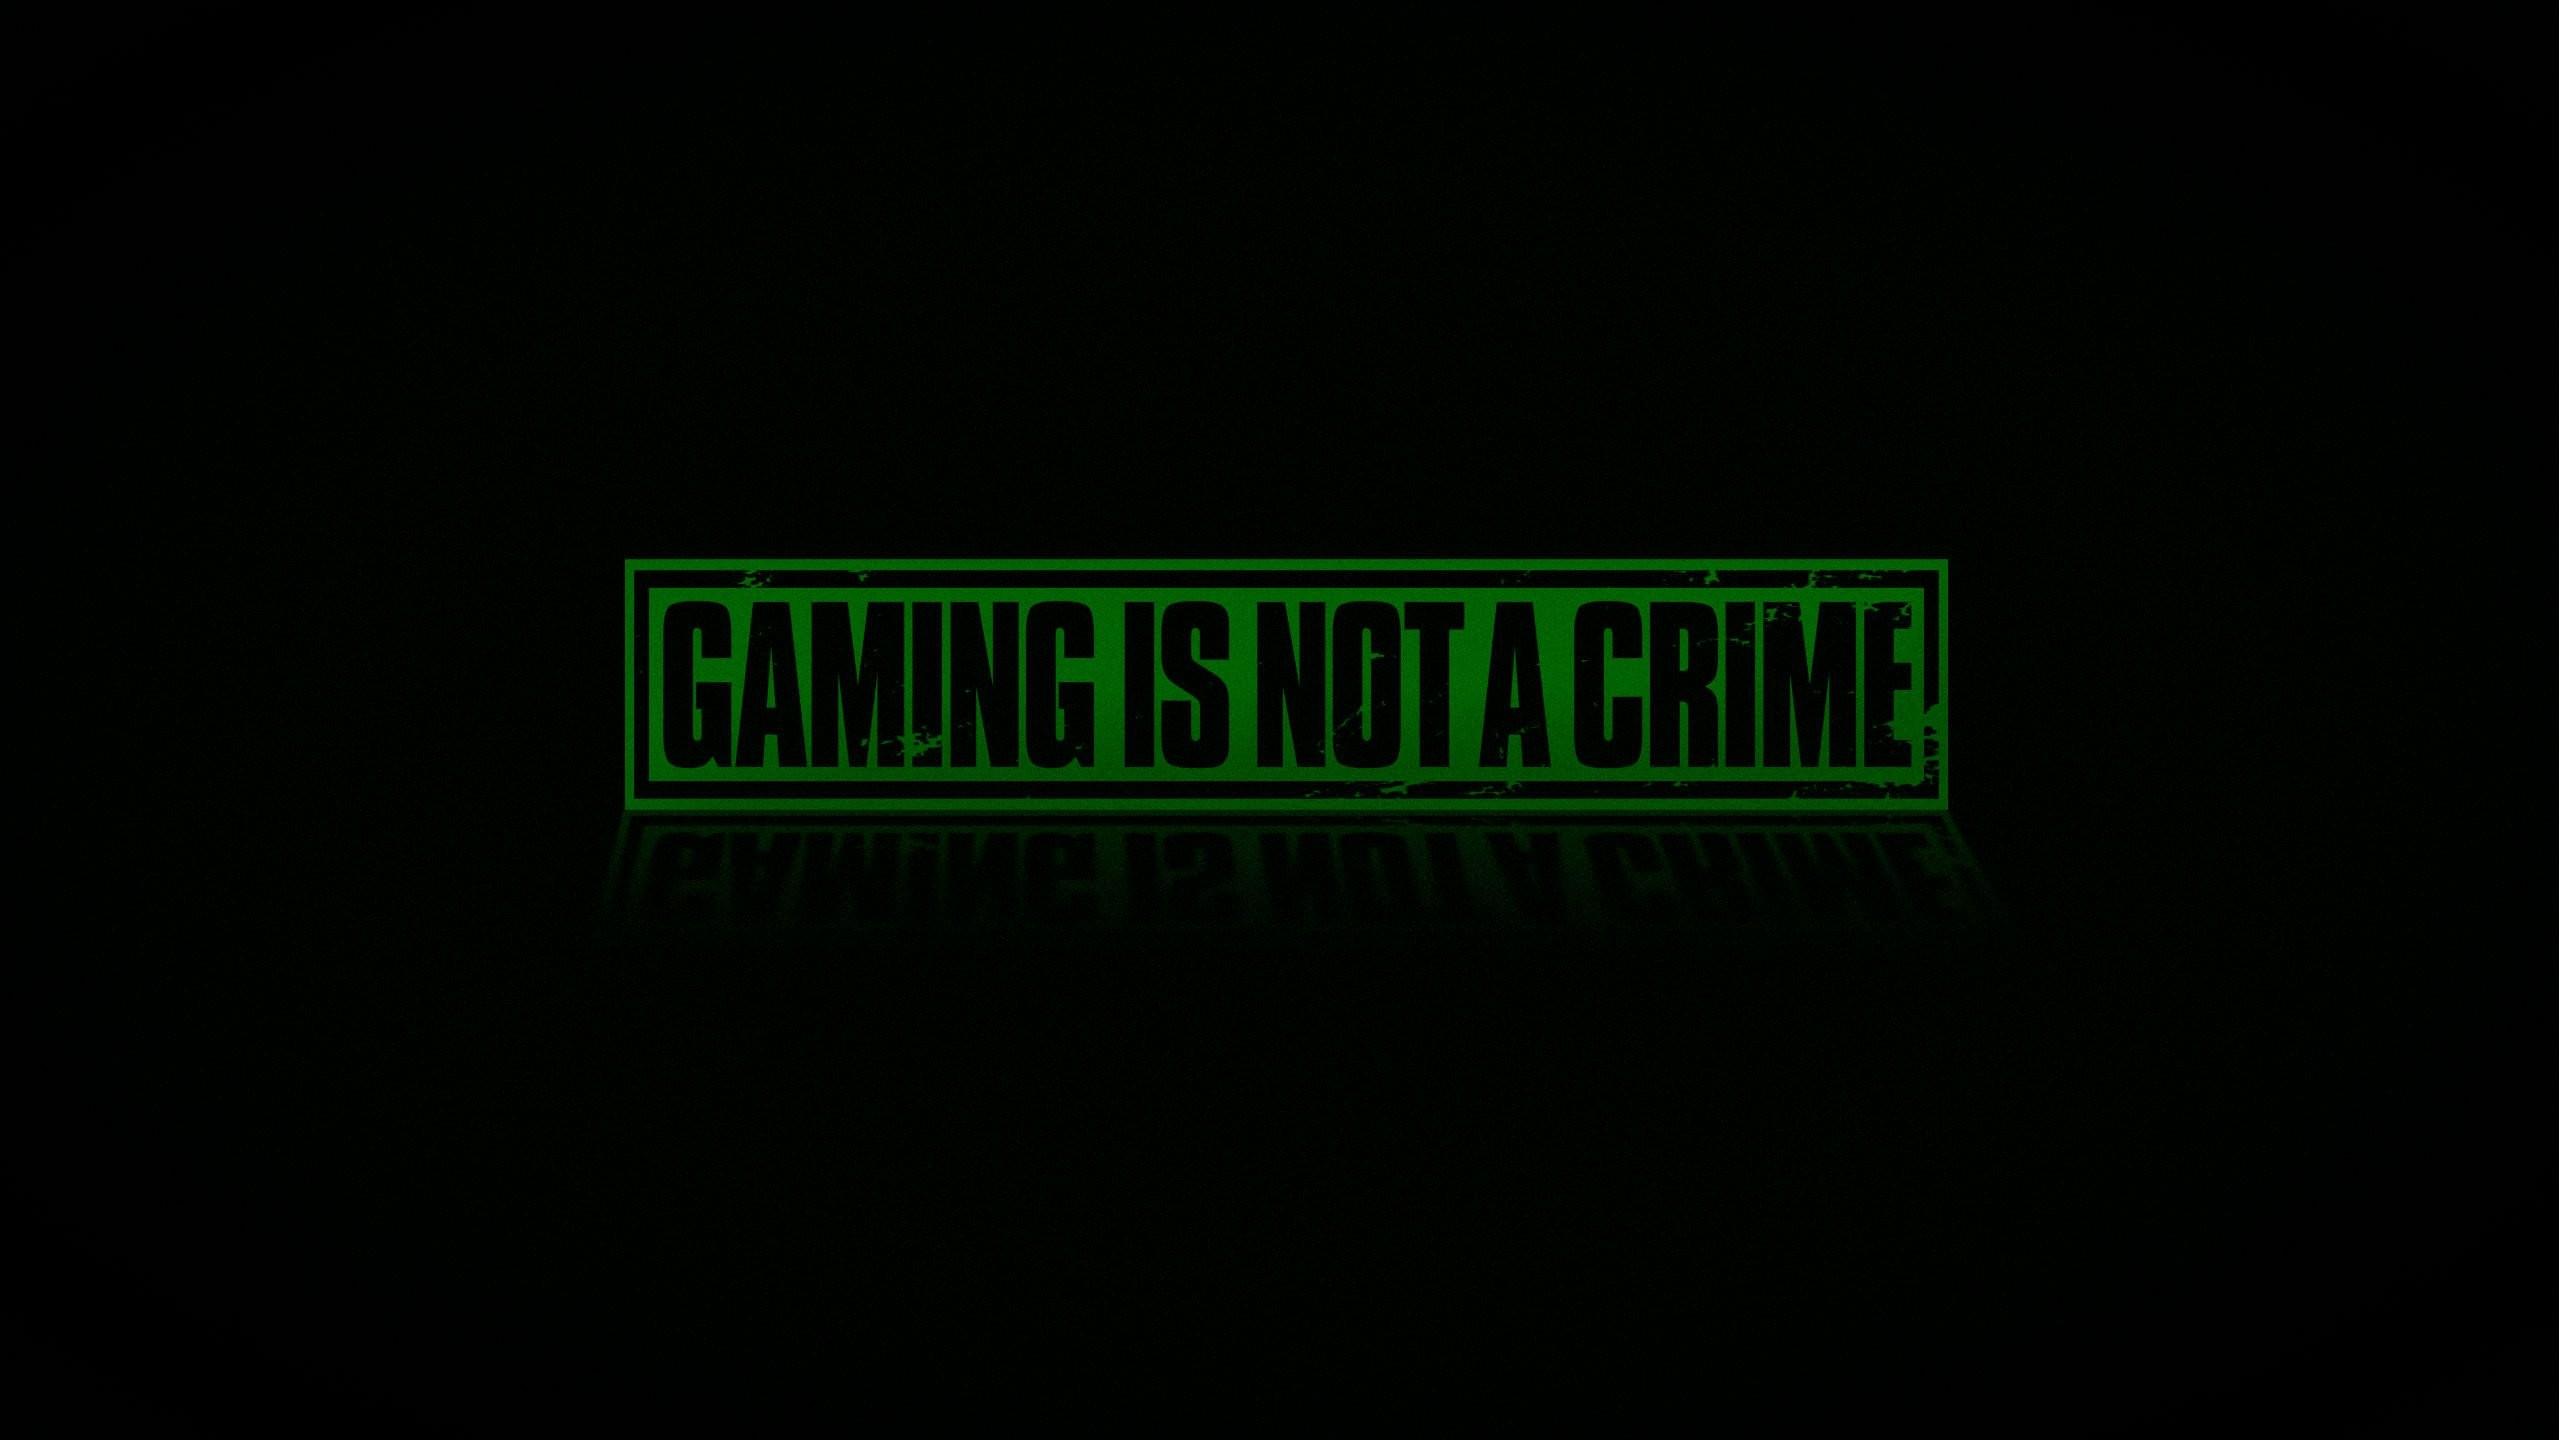 Game Is Not A Crime 2560x1440 Wallpaper Teahub Io